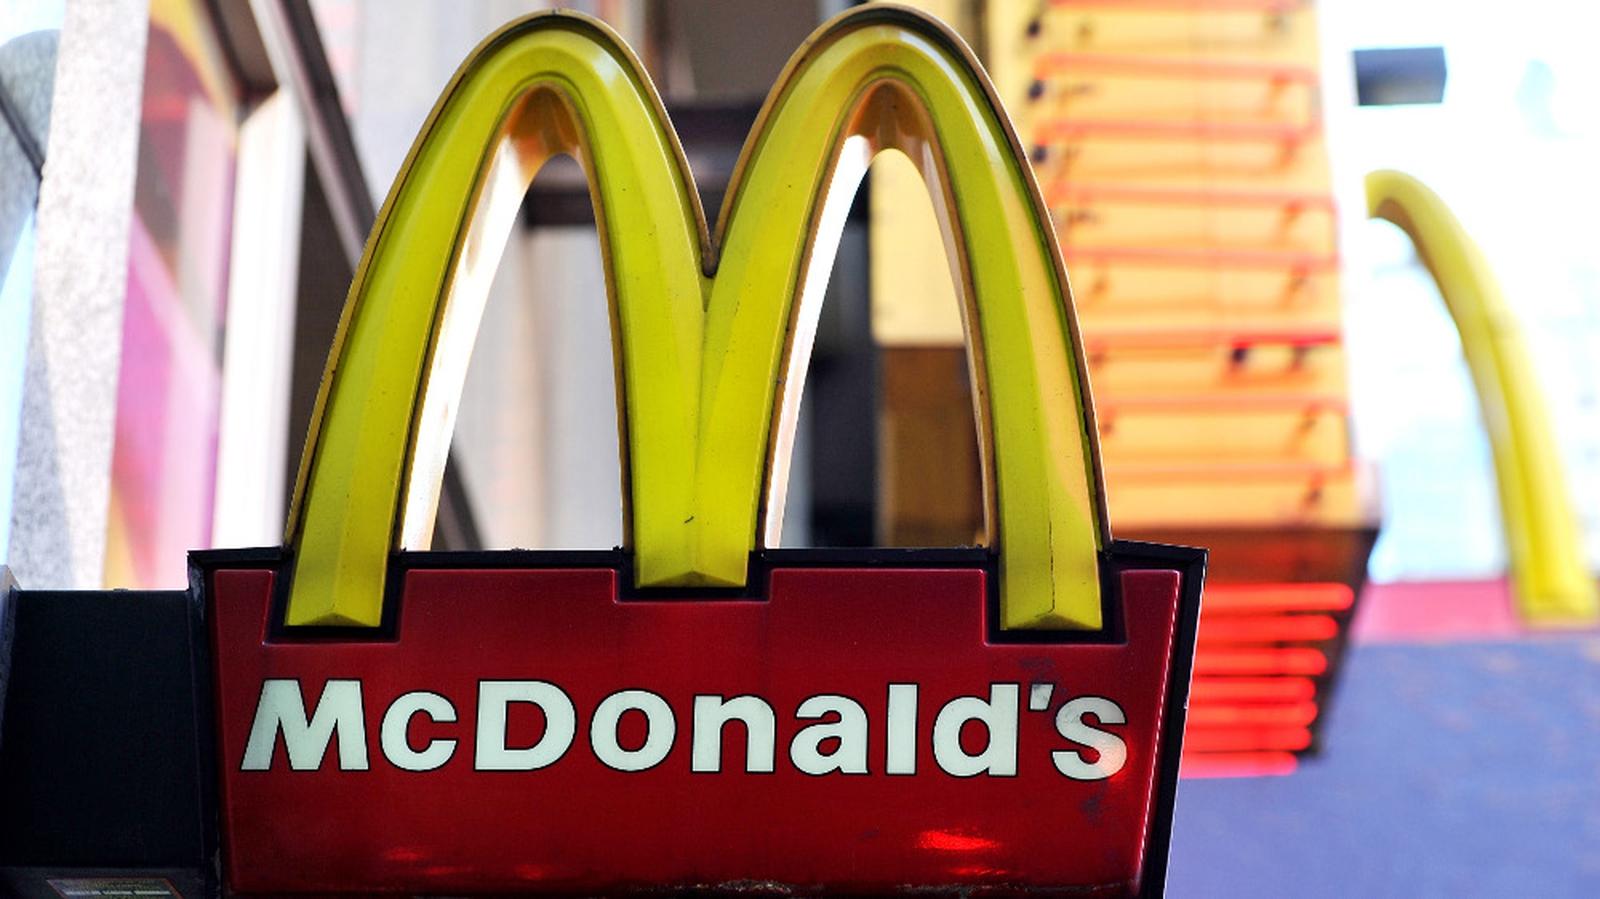 McDonald's announces 800 jobs for Ireland